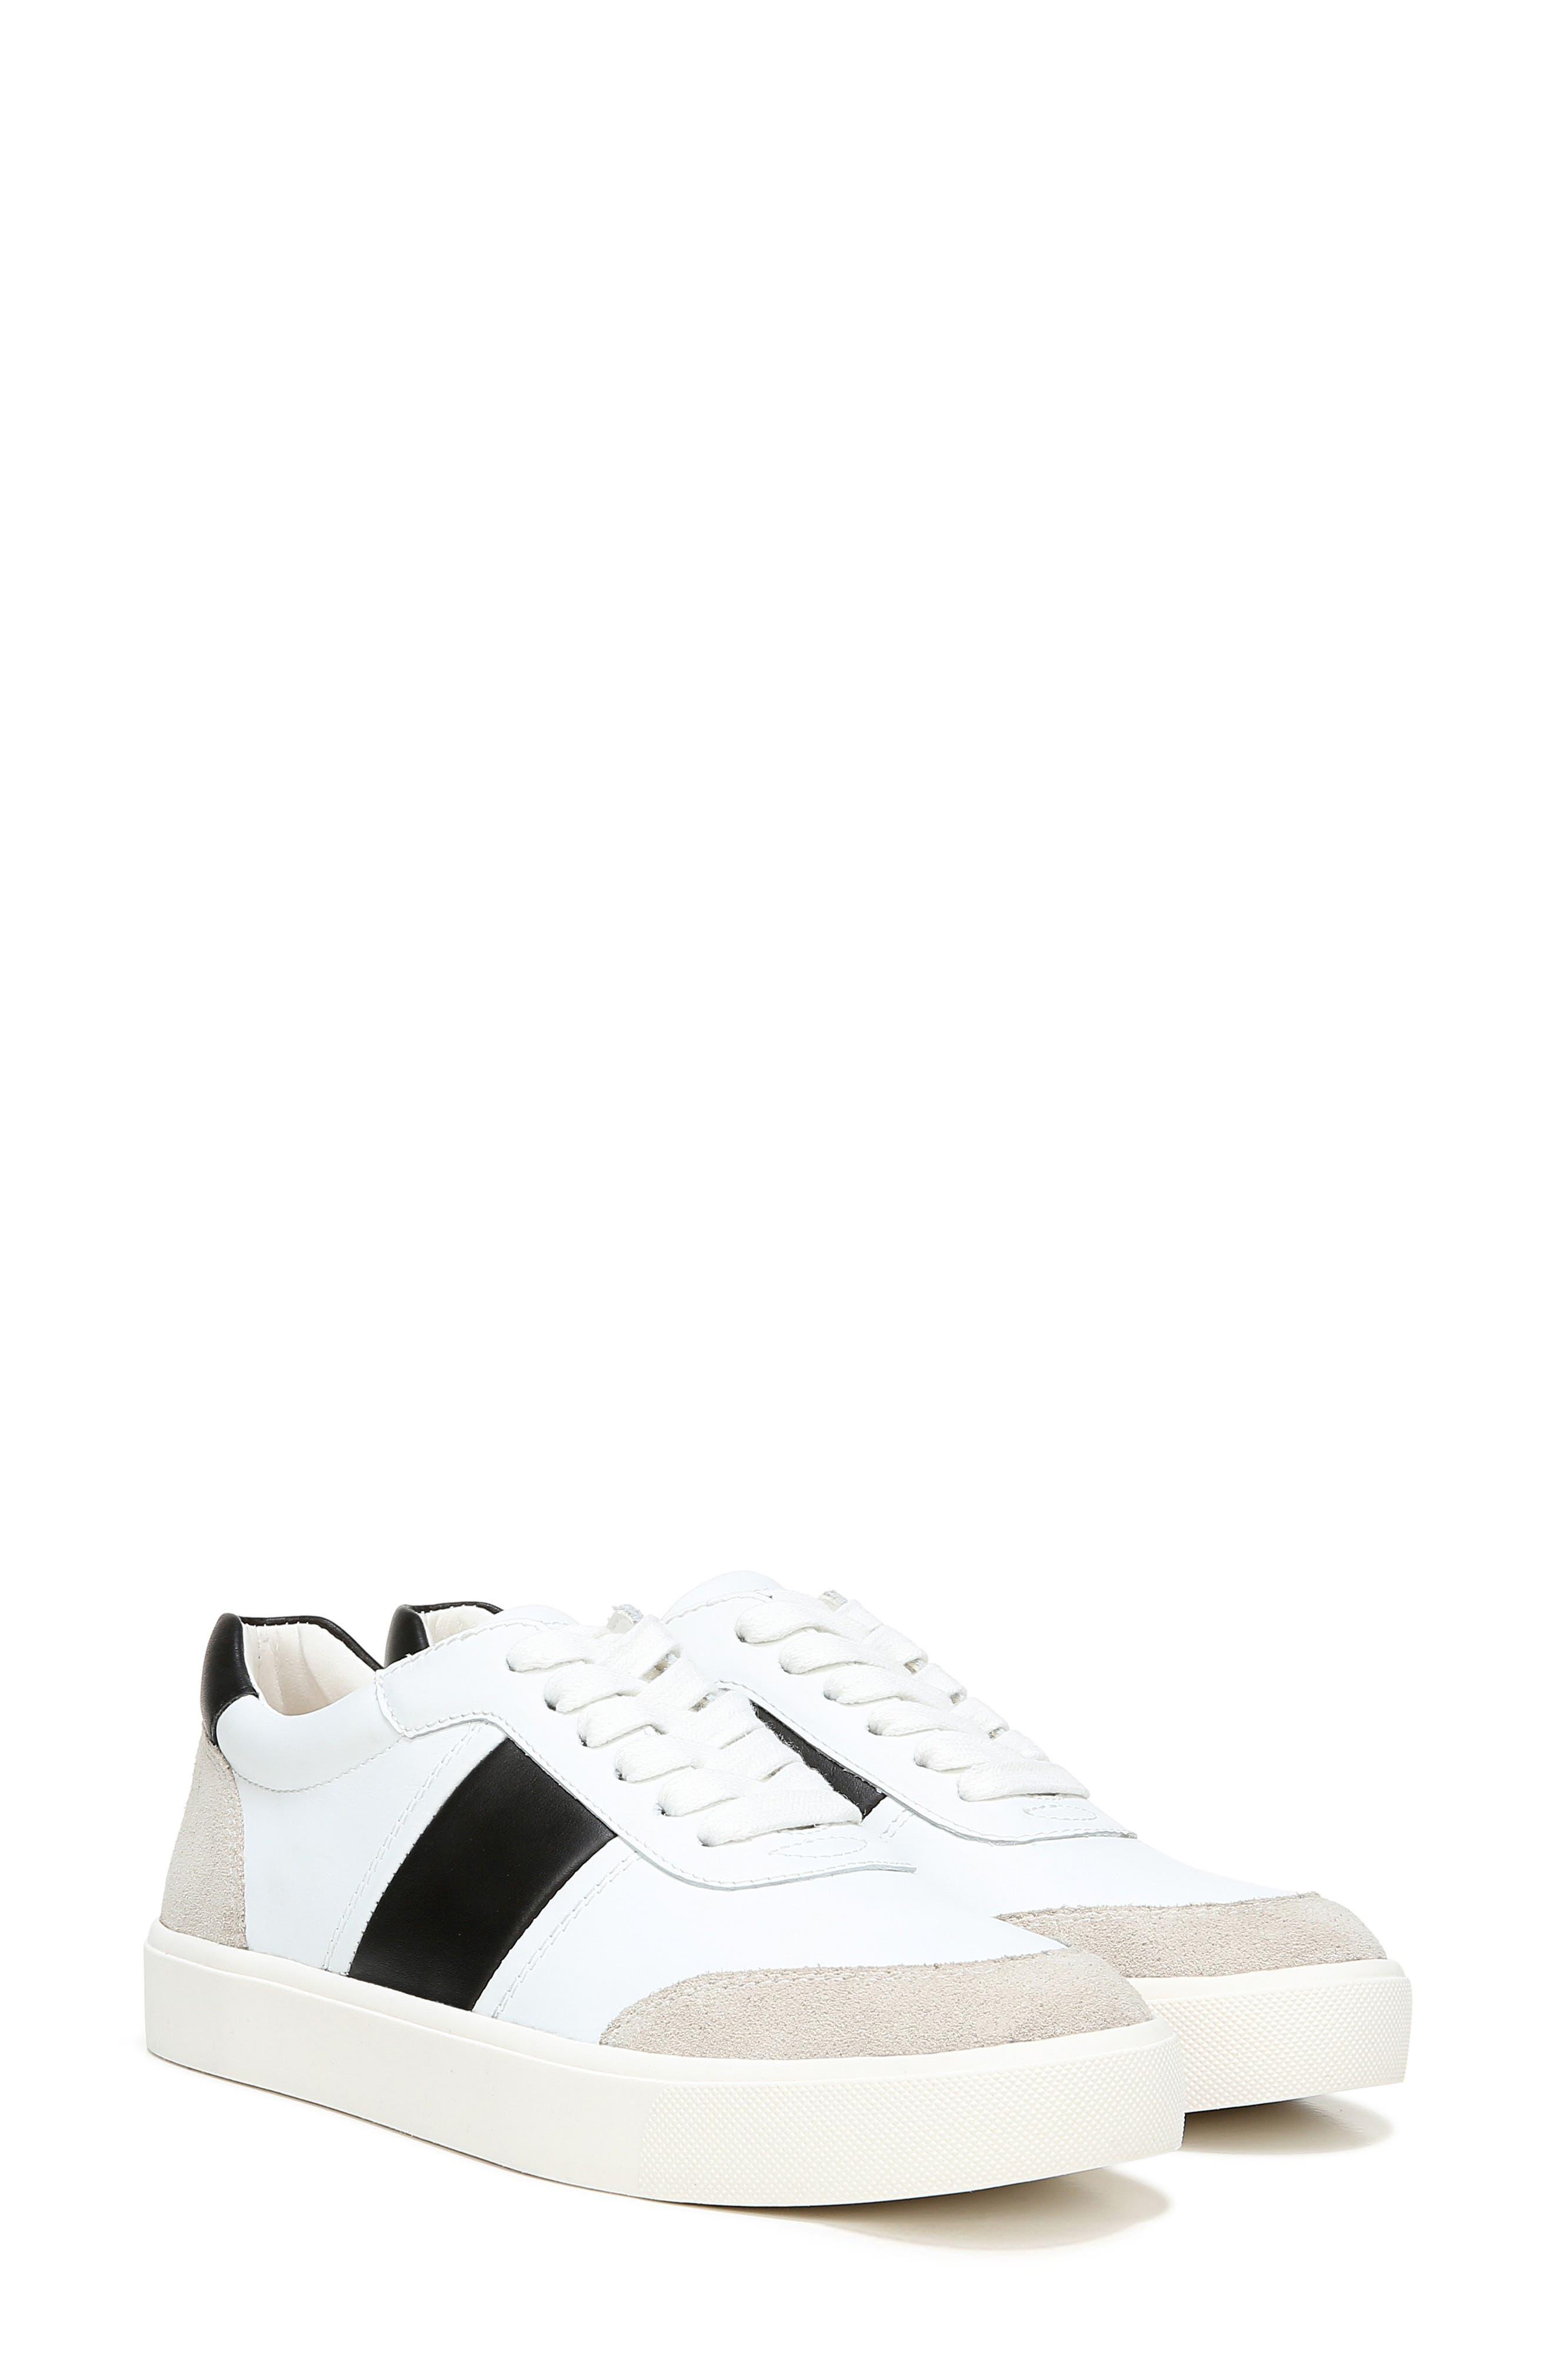 Women's Sam Edelman Sneakers \u0026 Athletic